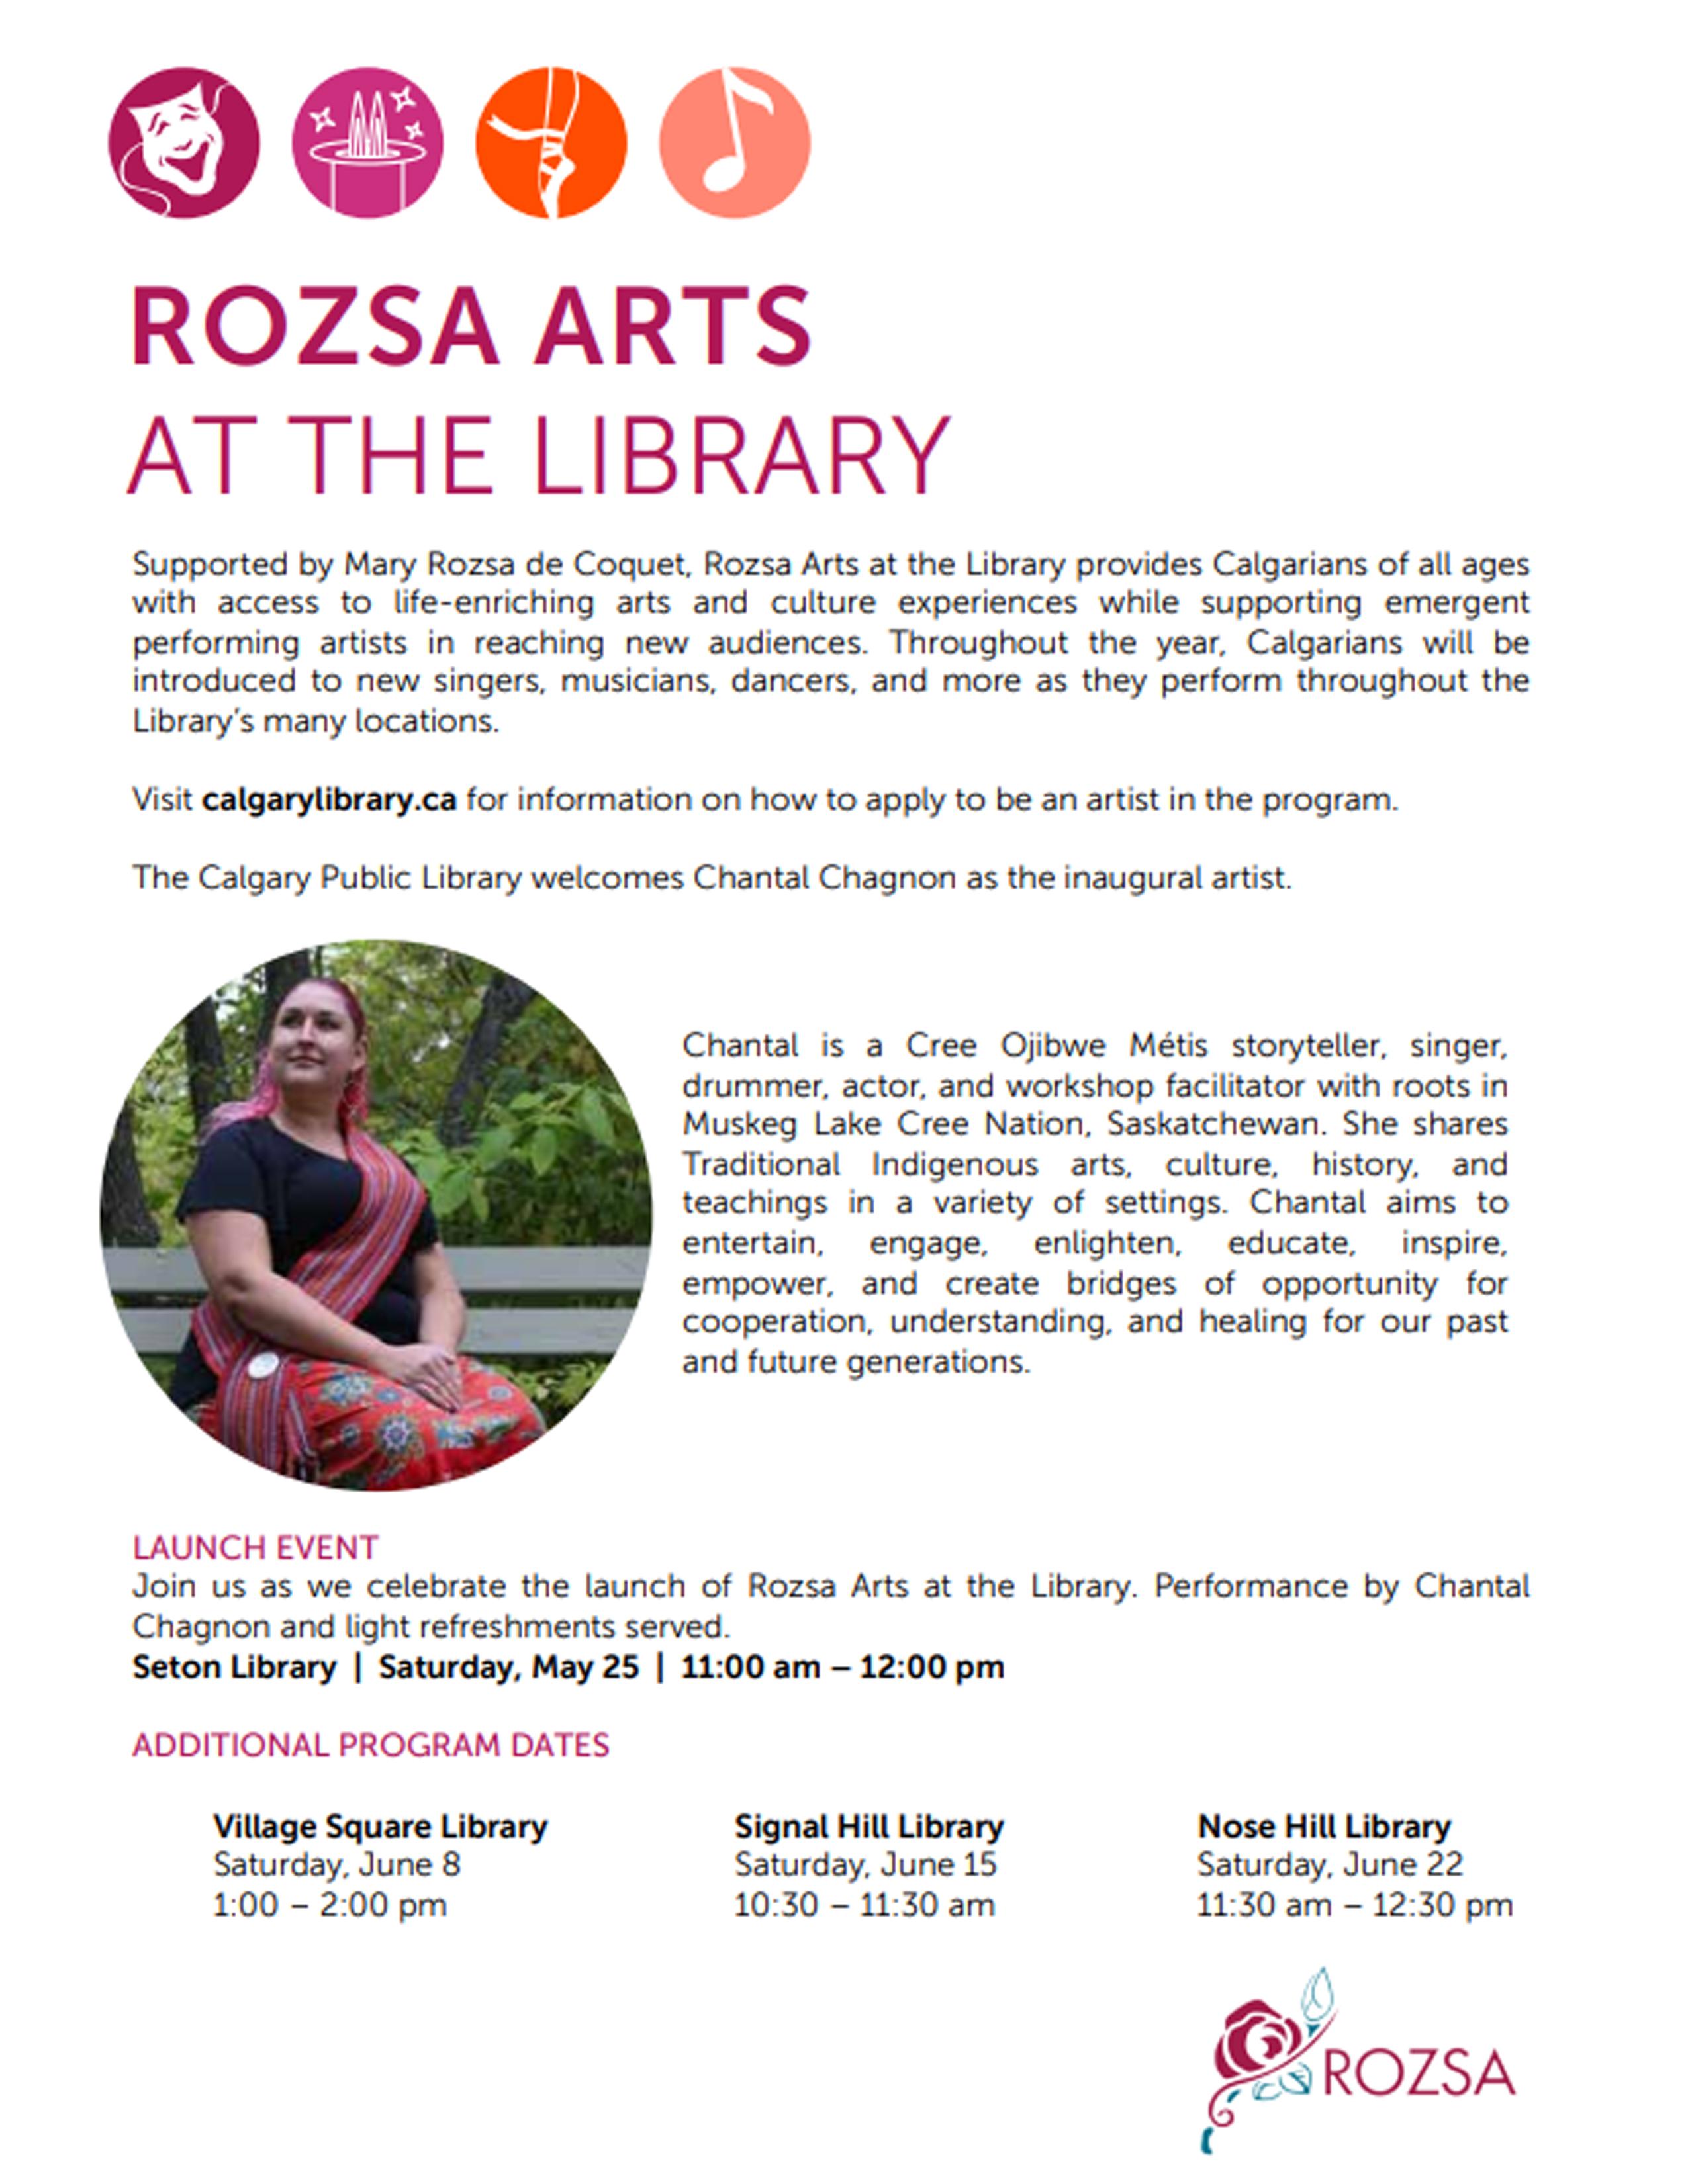 CPL Rosza Arts